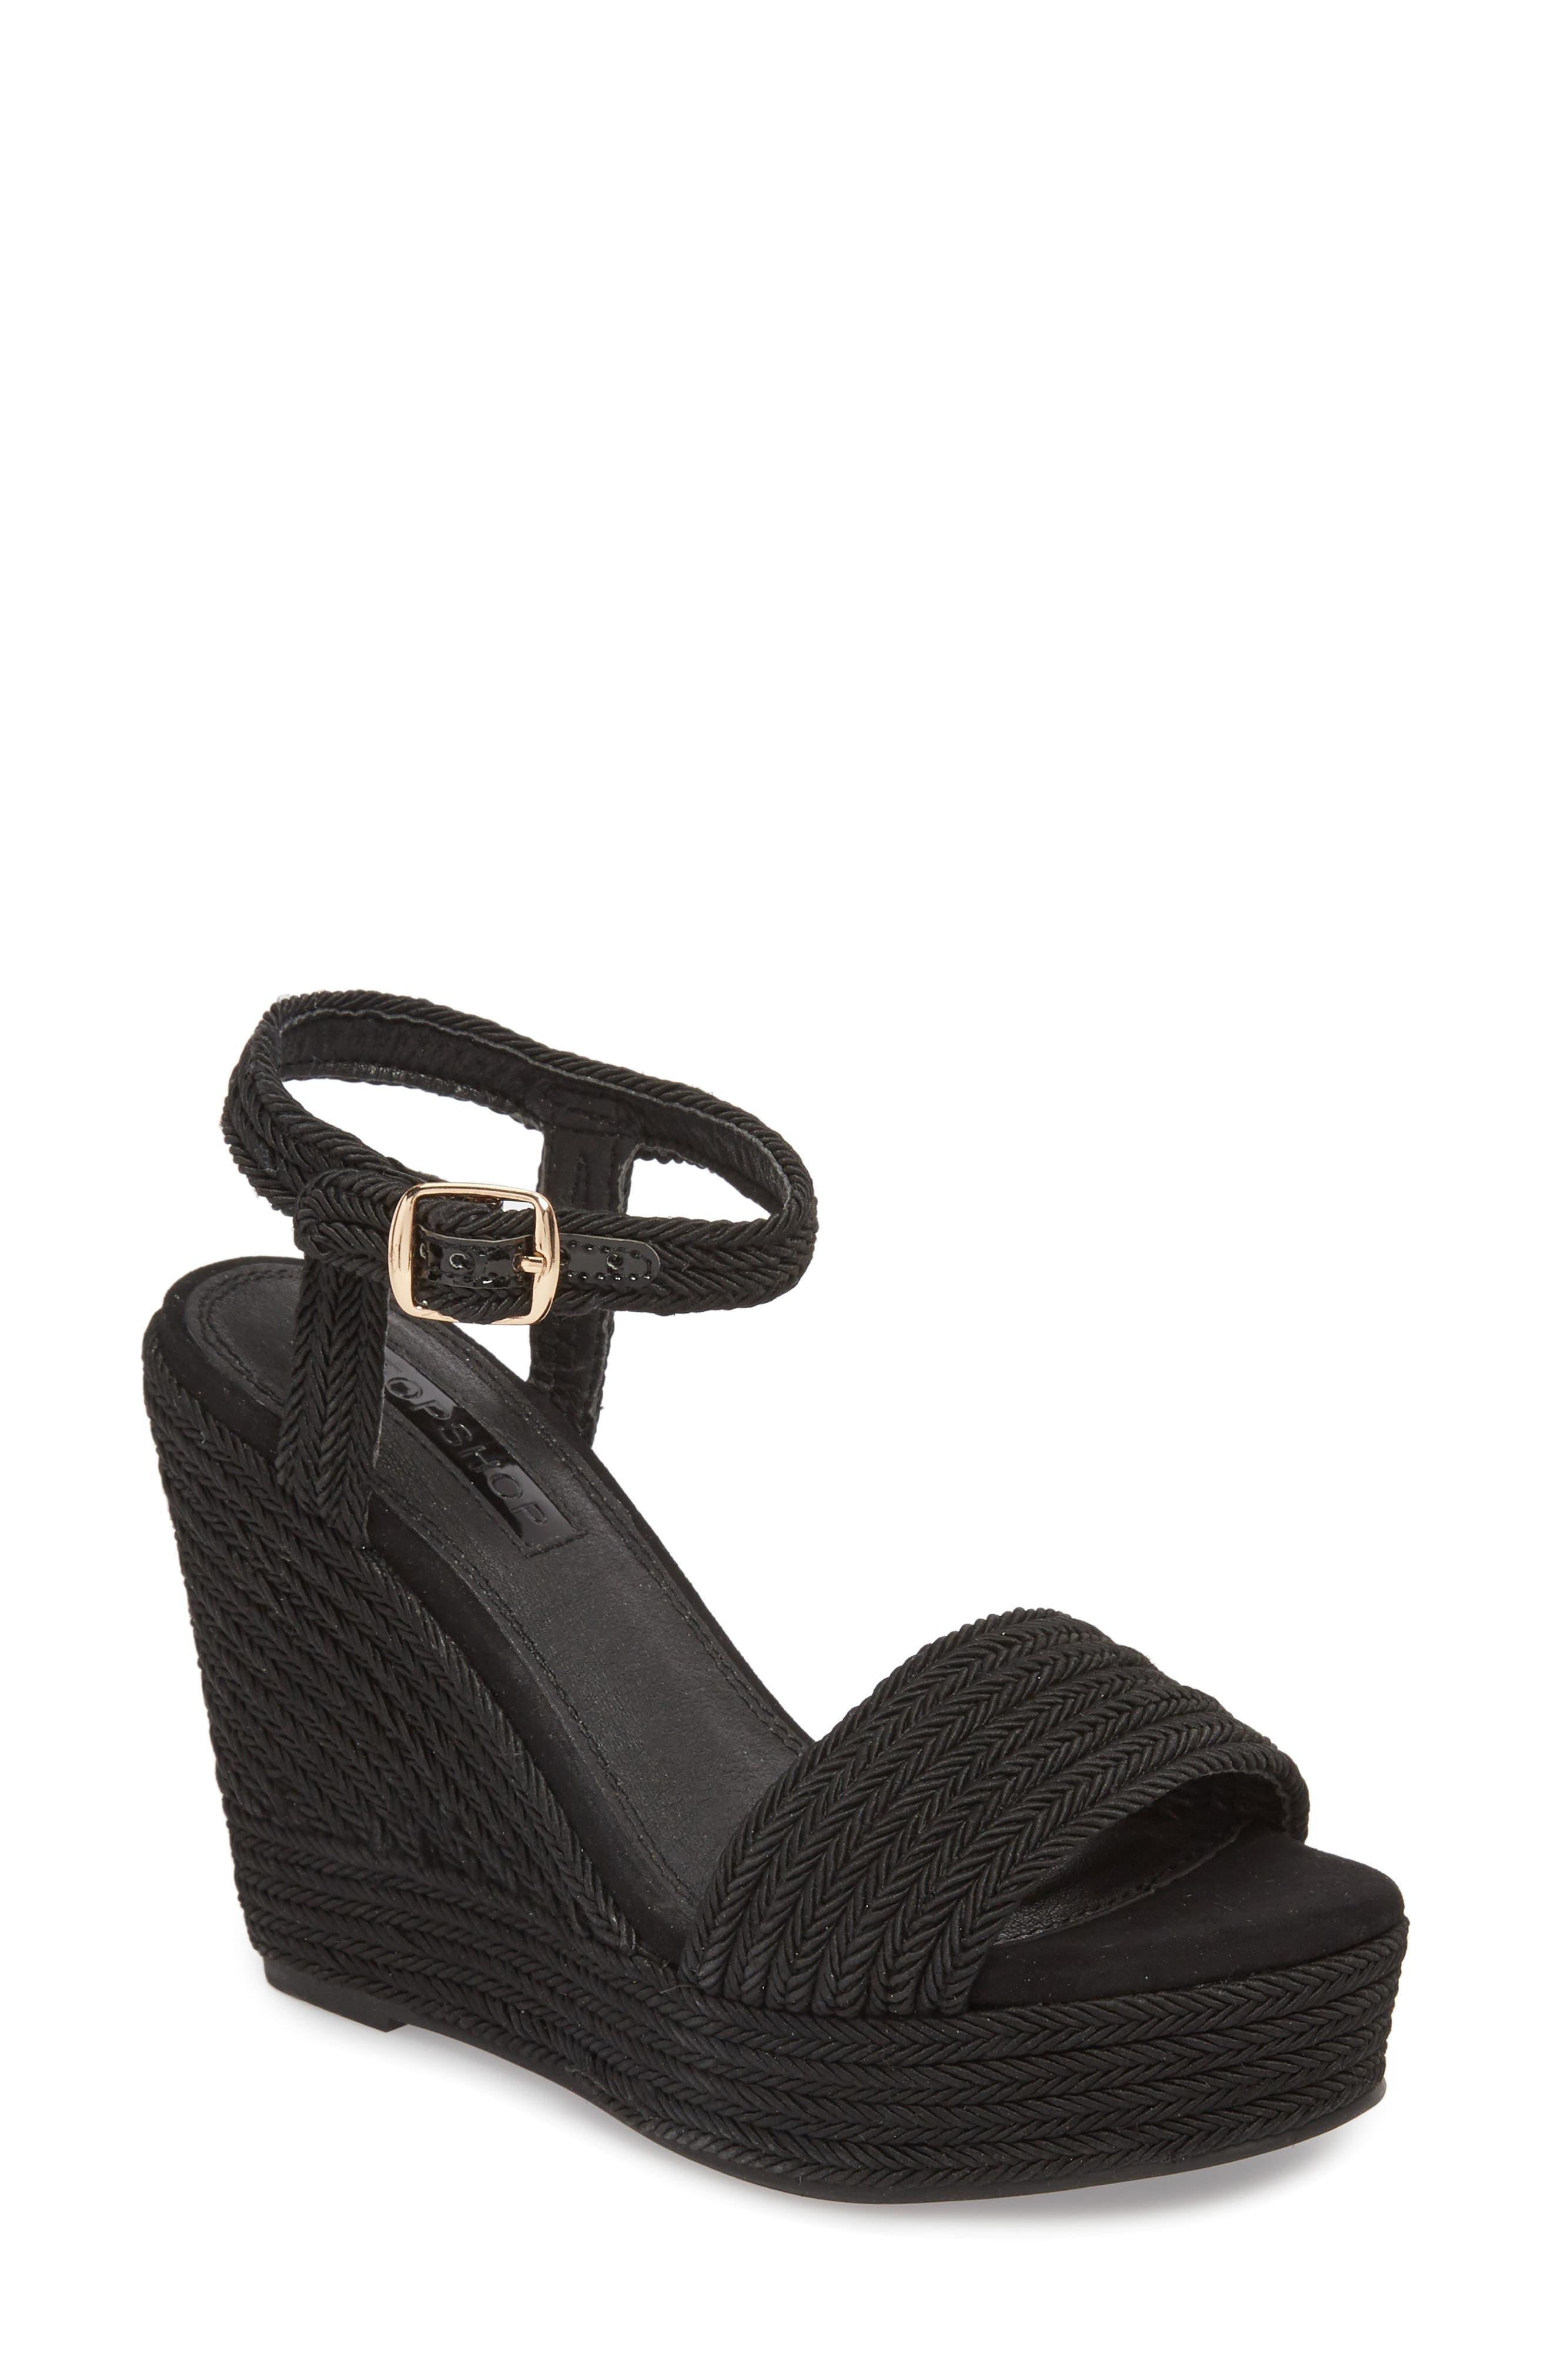 Wild Rope Platform Wedge Sandal,                             Main thumbnail 1, color,                             BLACK MULTI